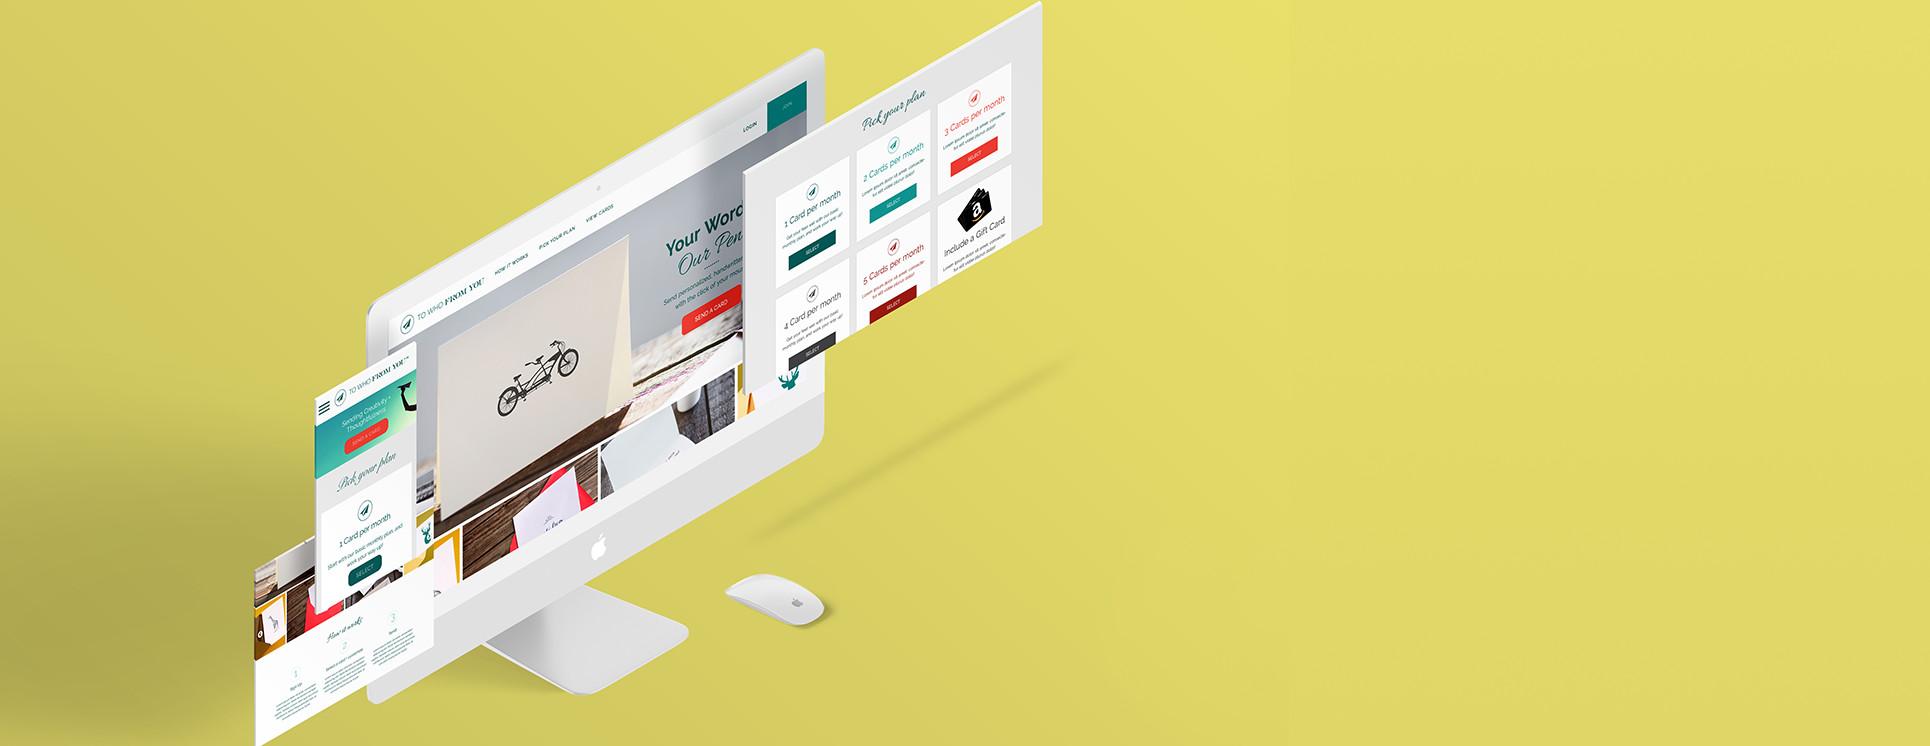 digital marketing & web design | kicks digital marketing